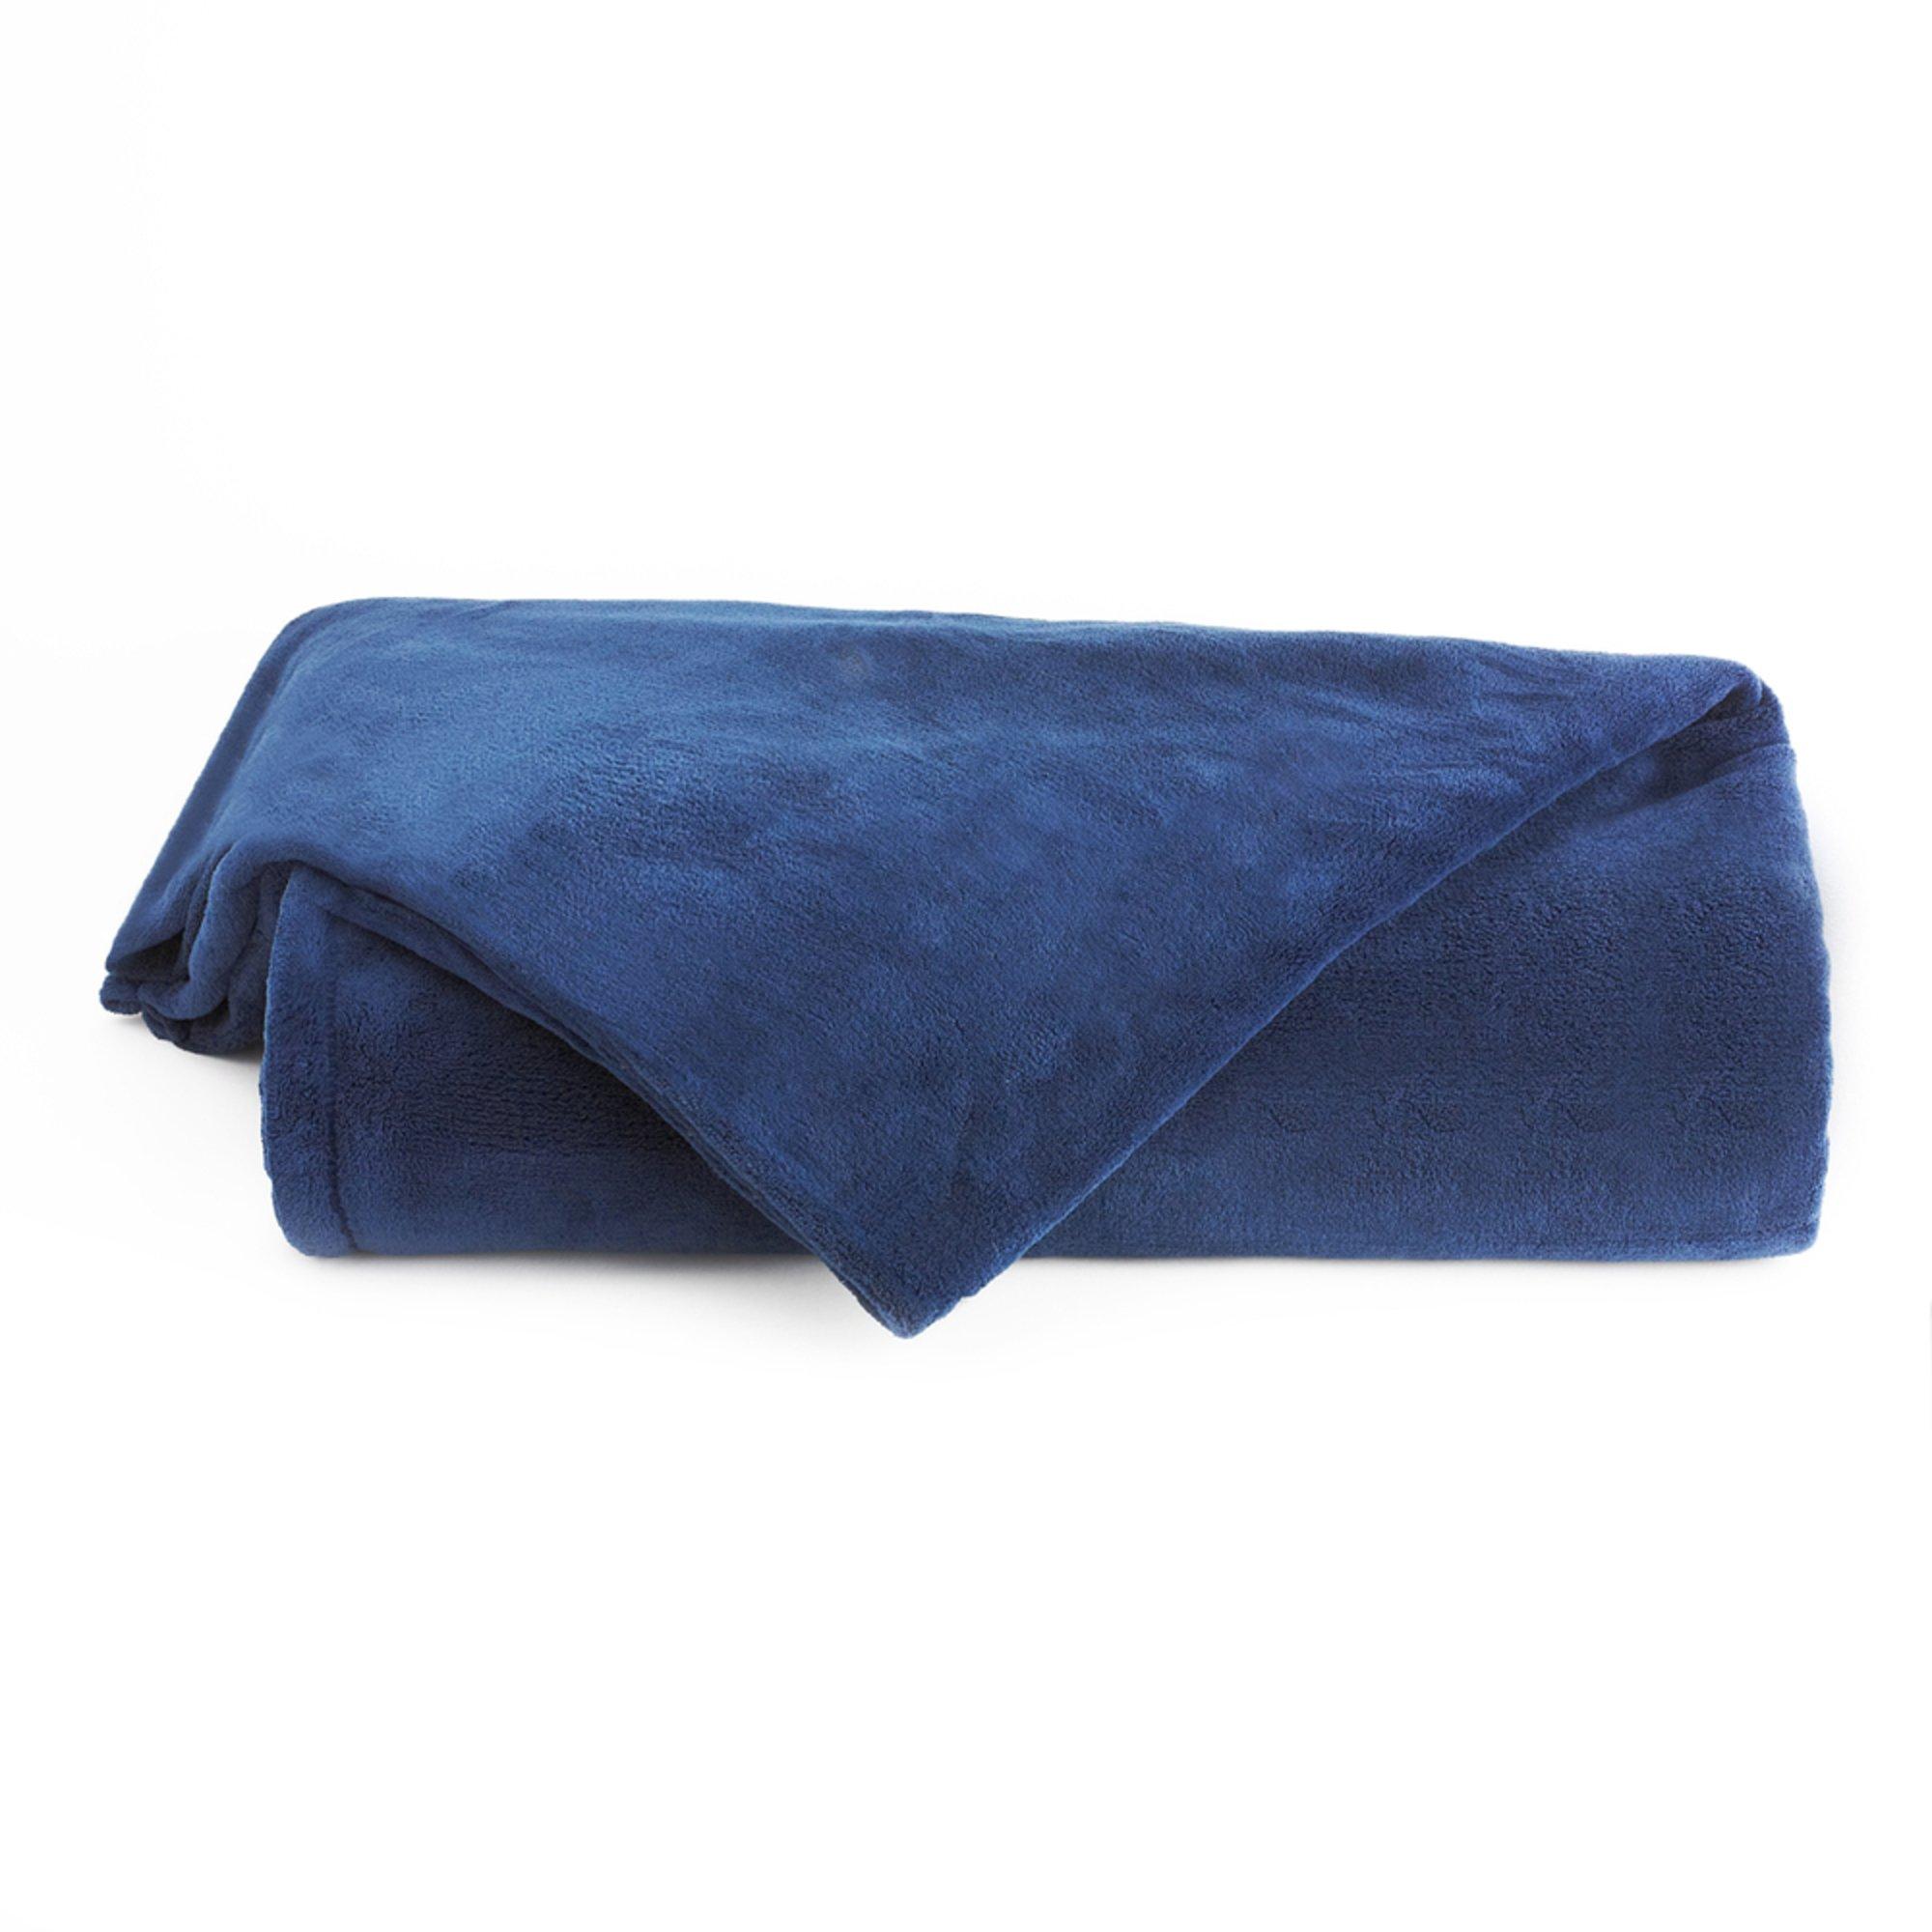 Berkshire Plush Blanket Navy Twin Basic Blankets